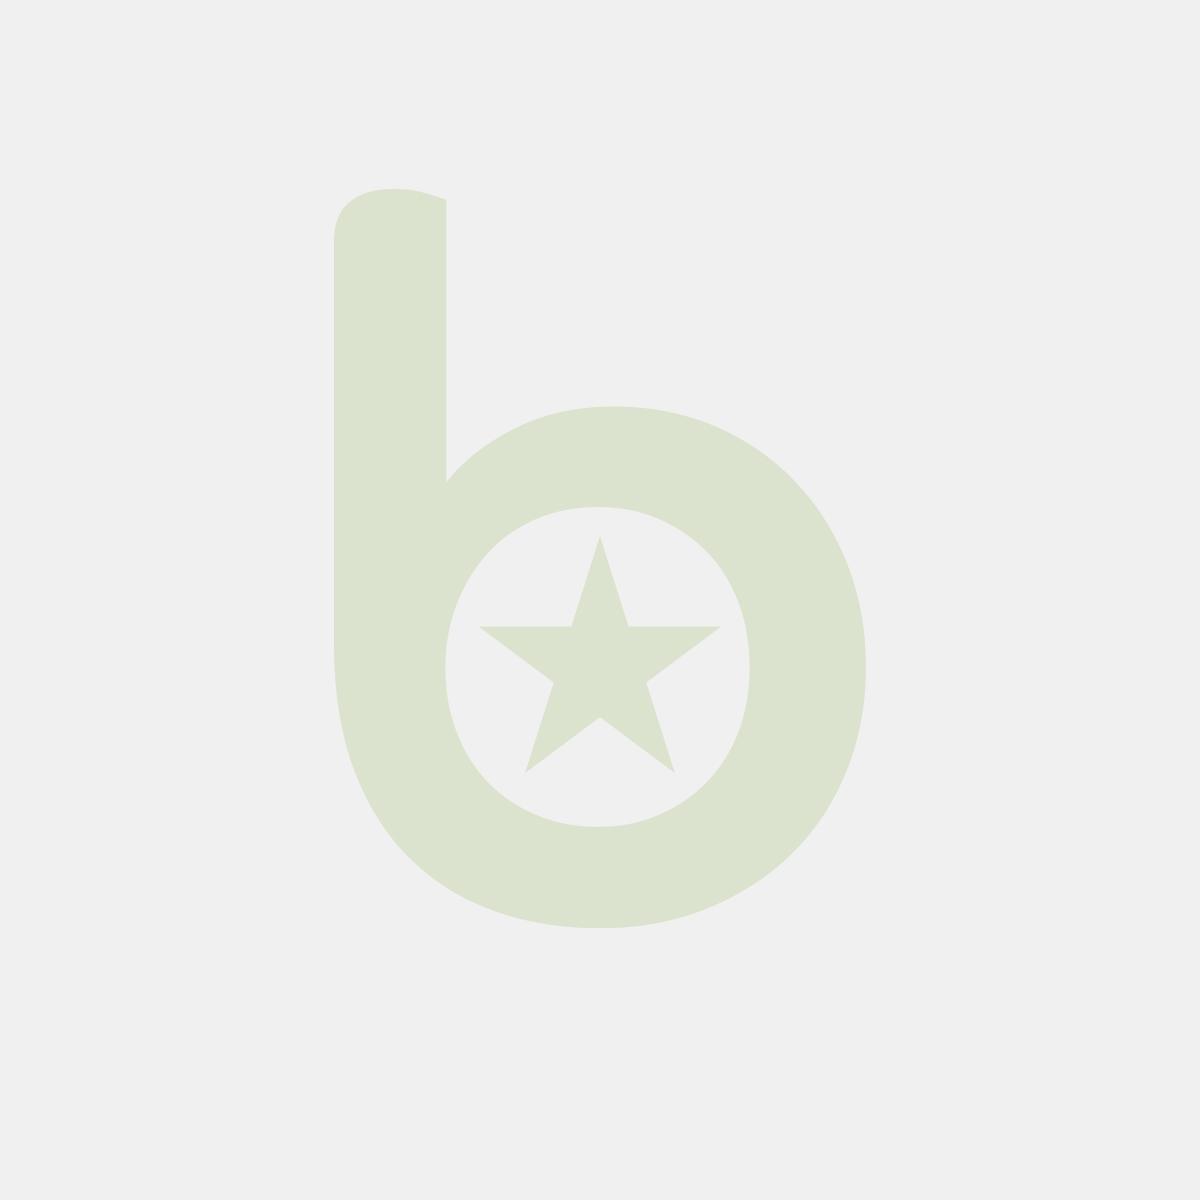 FINGERFOOD - patyczki PIURE 15cm tłoczone op. 500 sztuk